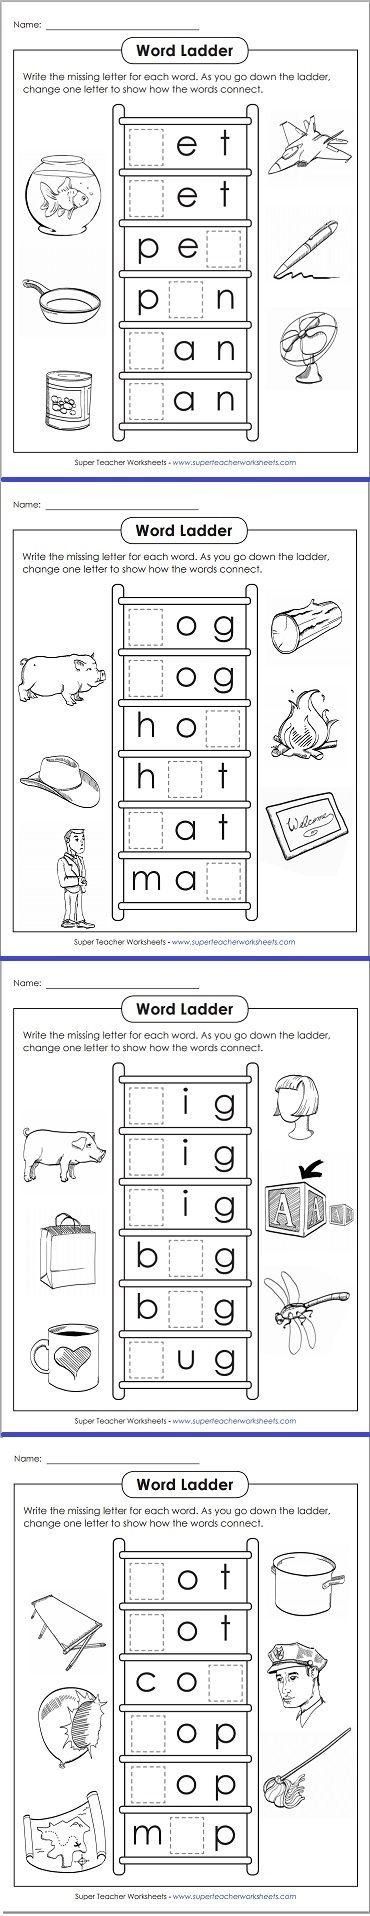 Word Ladder Worksheets Phonics Kindergarten Word Ladders Phonics Practice Word ladder worksheets